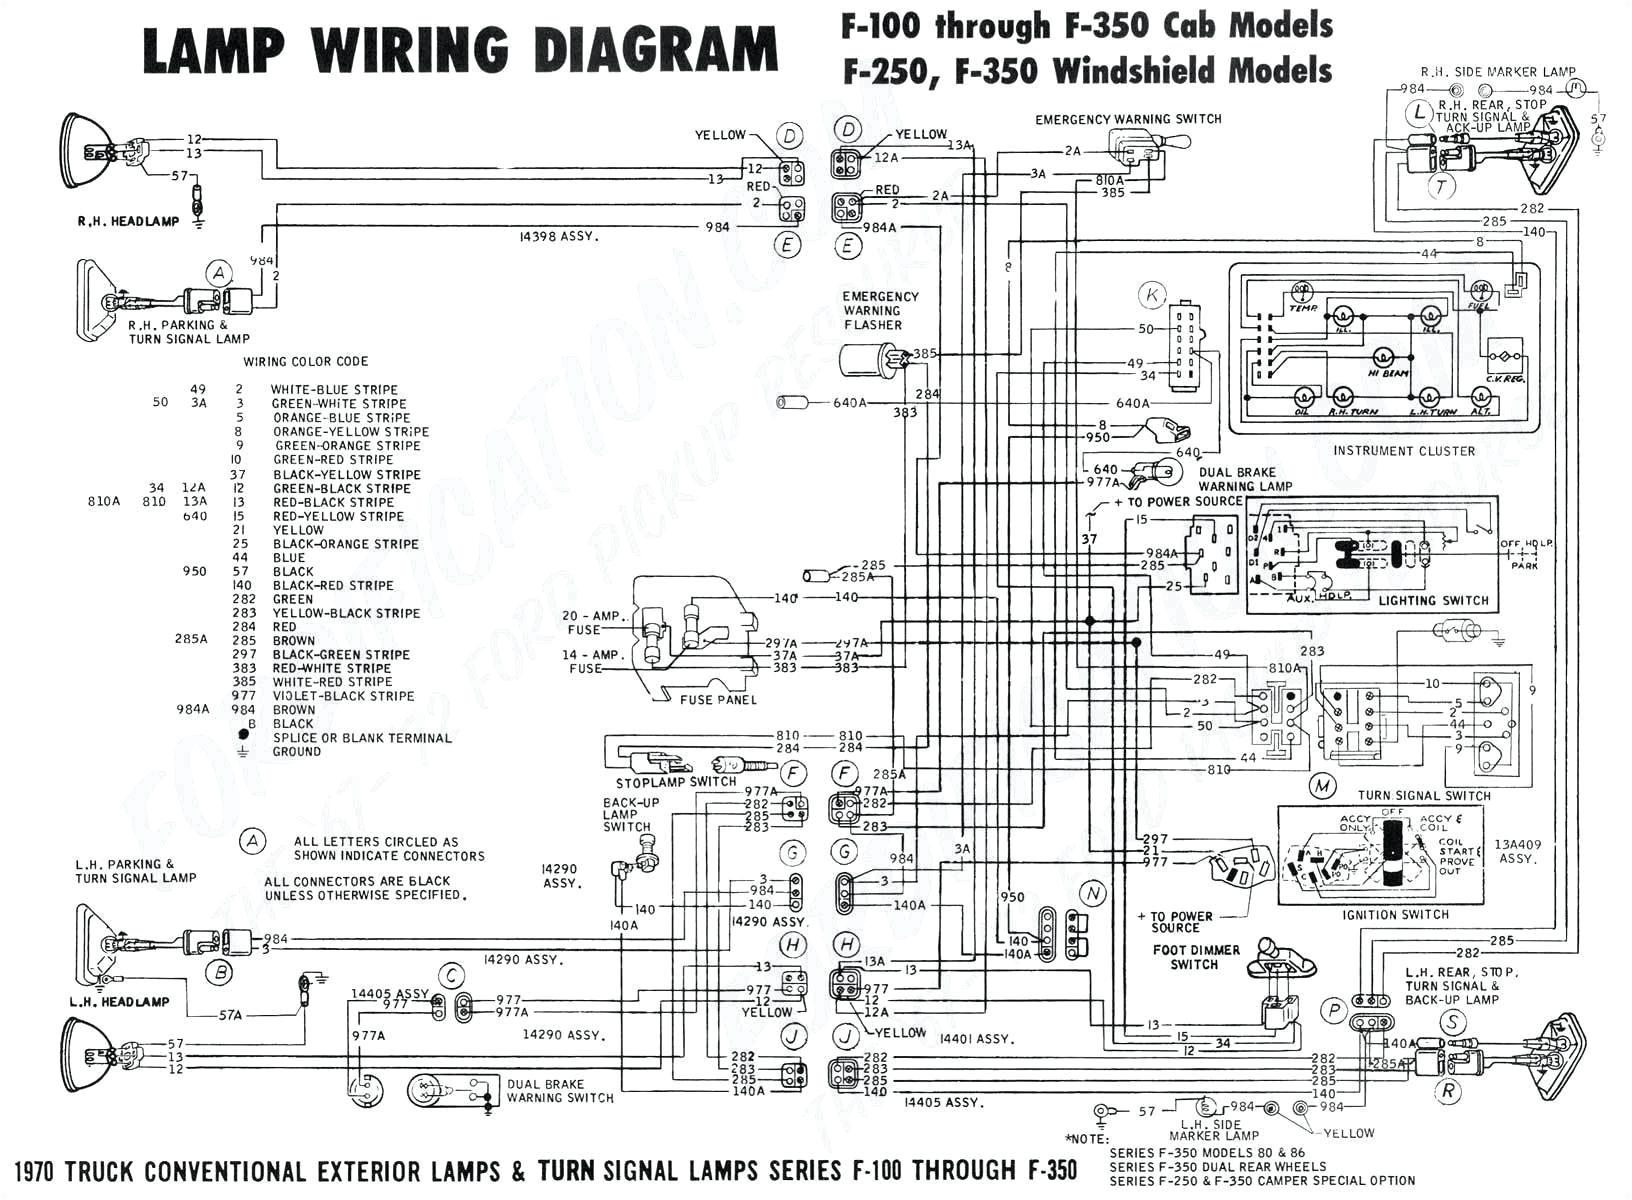 wiring diagram jbl e80 wiring diagram page wiring diagram jbl e80